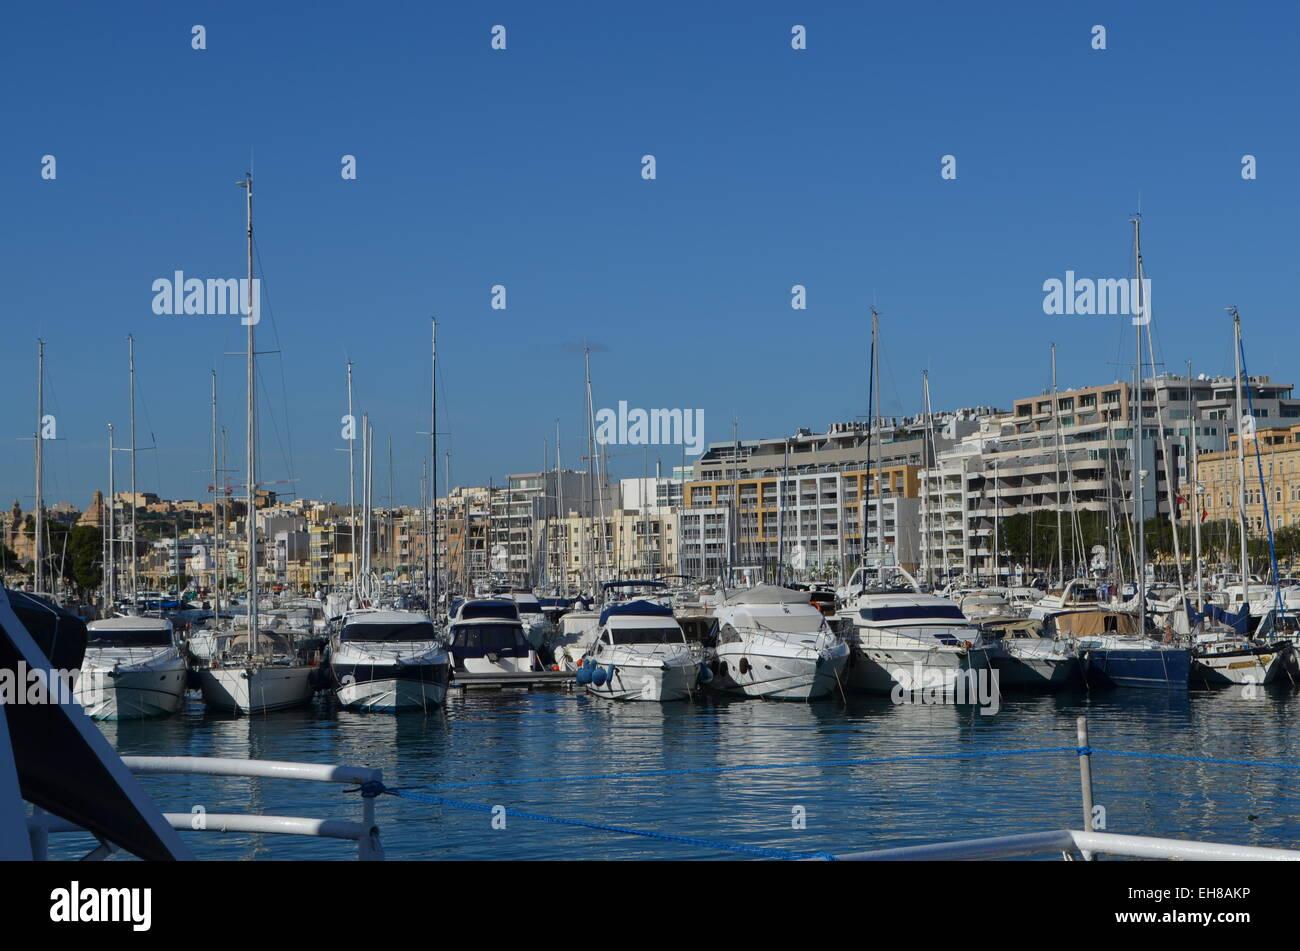 Valletta, A great variety of small sailing boats and yachts  at anchor along the Sliema waterfront. - Stock Image